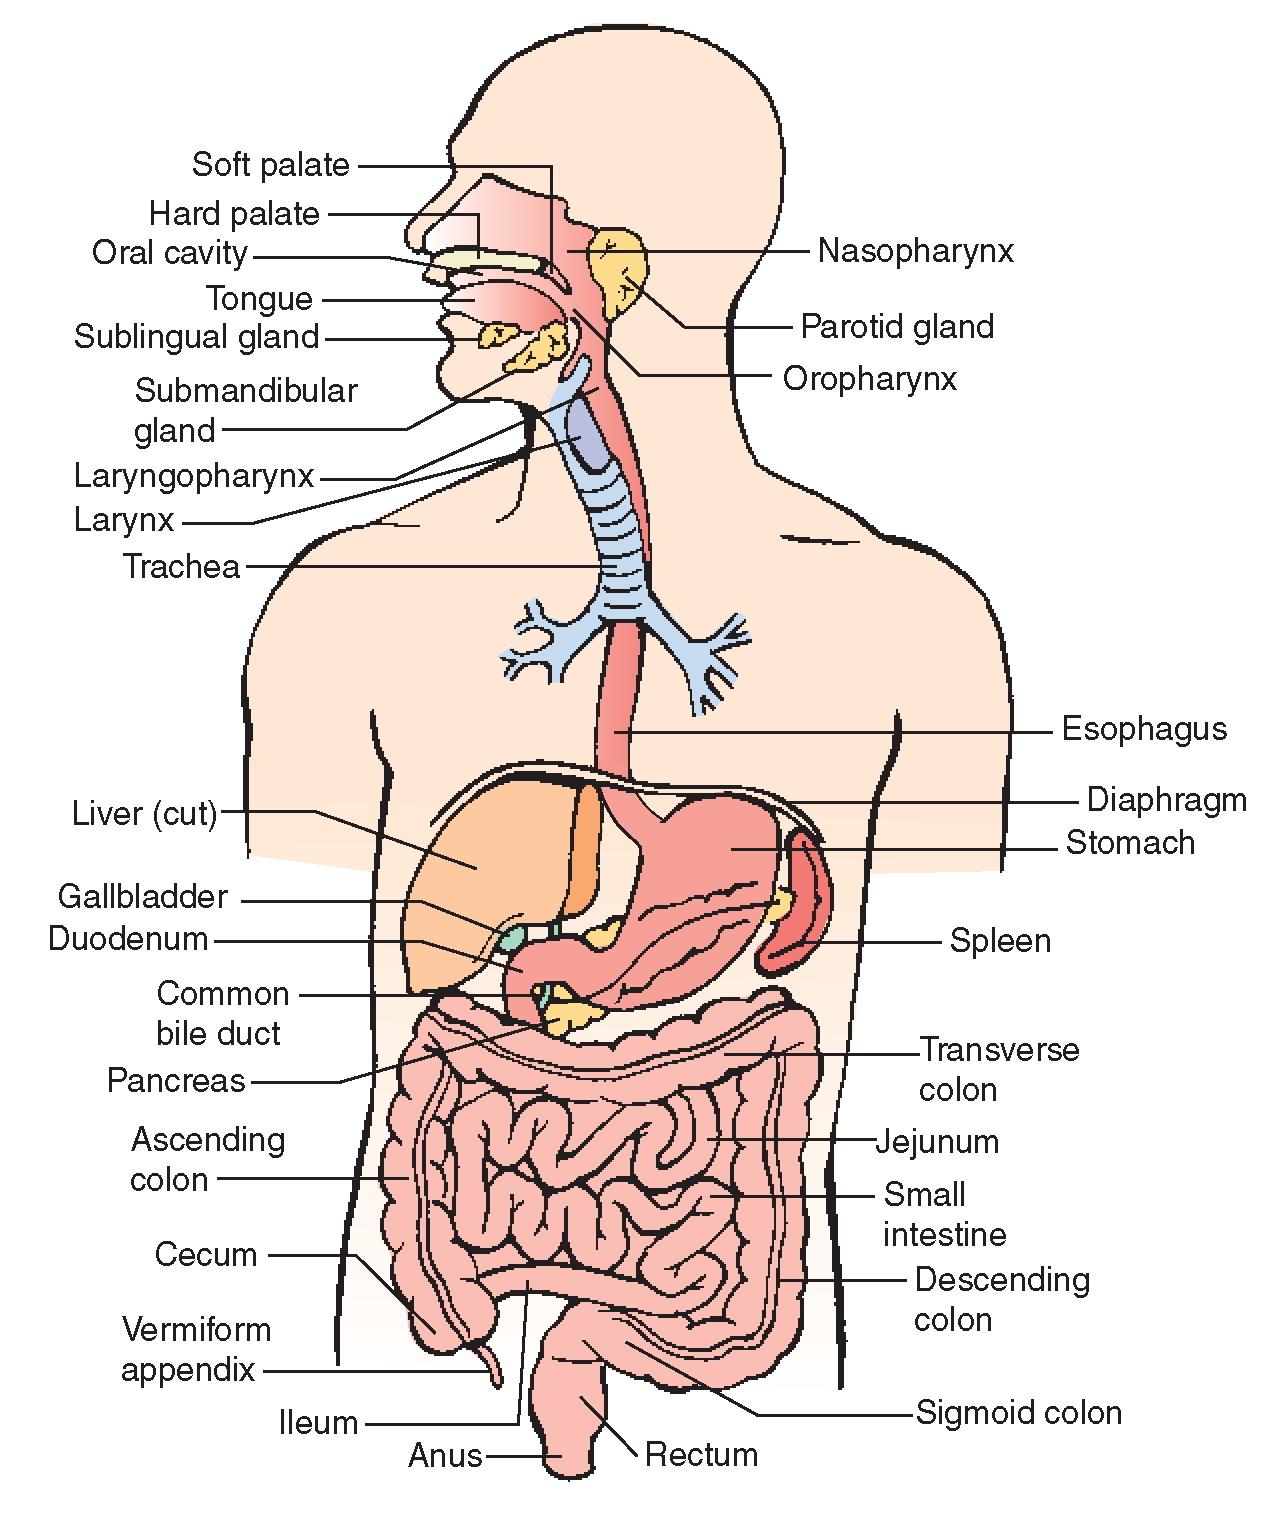 Digestive System Diagram Worksheet Human Digestive System Diagram Worksheet Answers Anatomy Education